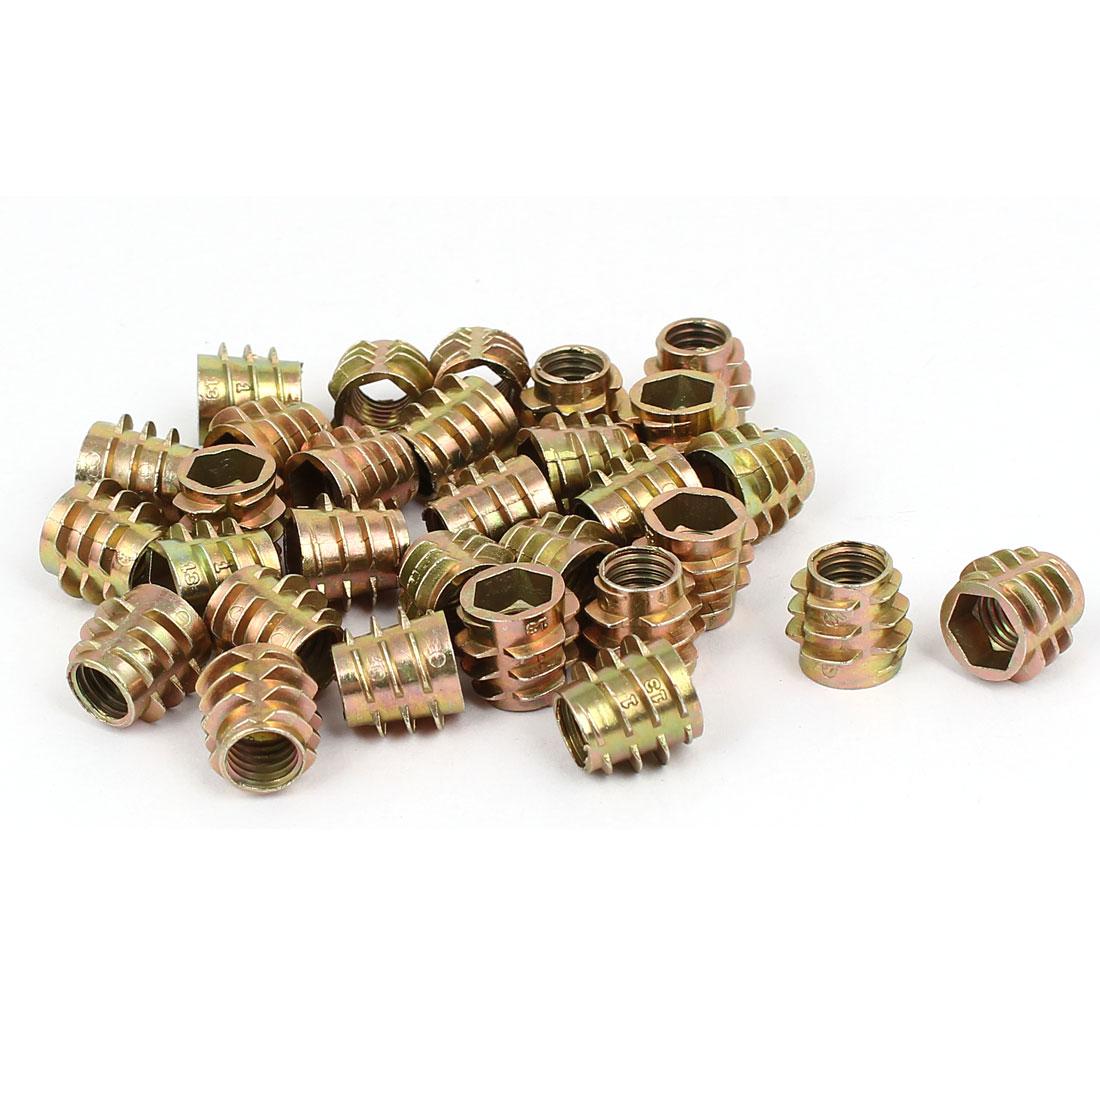 Wood Furniture Zinc Alloy Hex Socket Insert Screws E-Nuts M8x13mm 30pcs